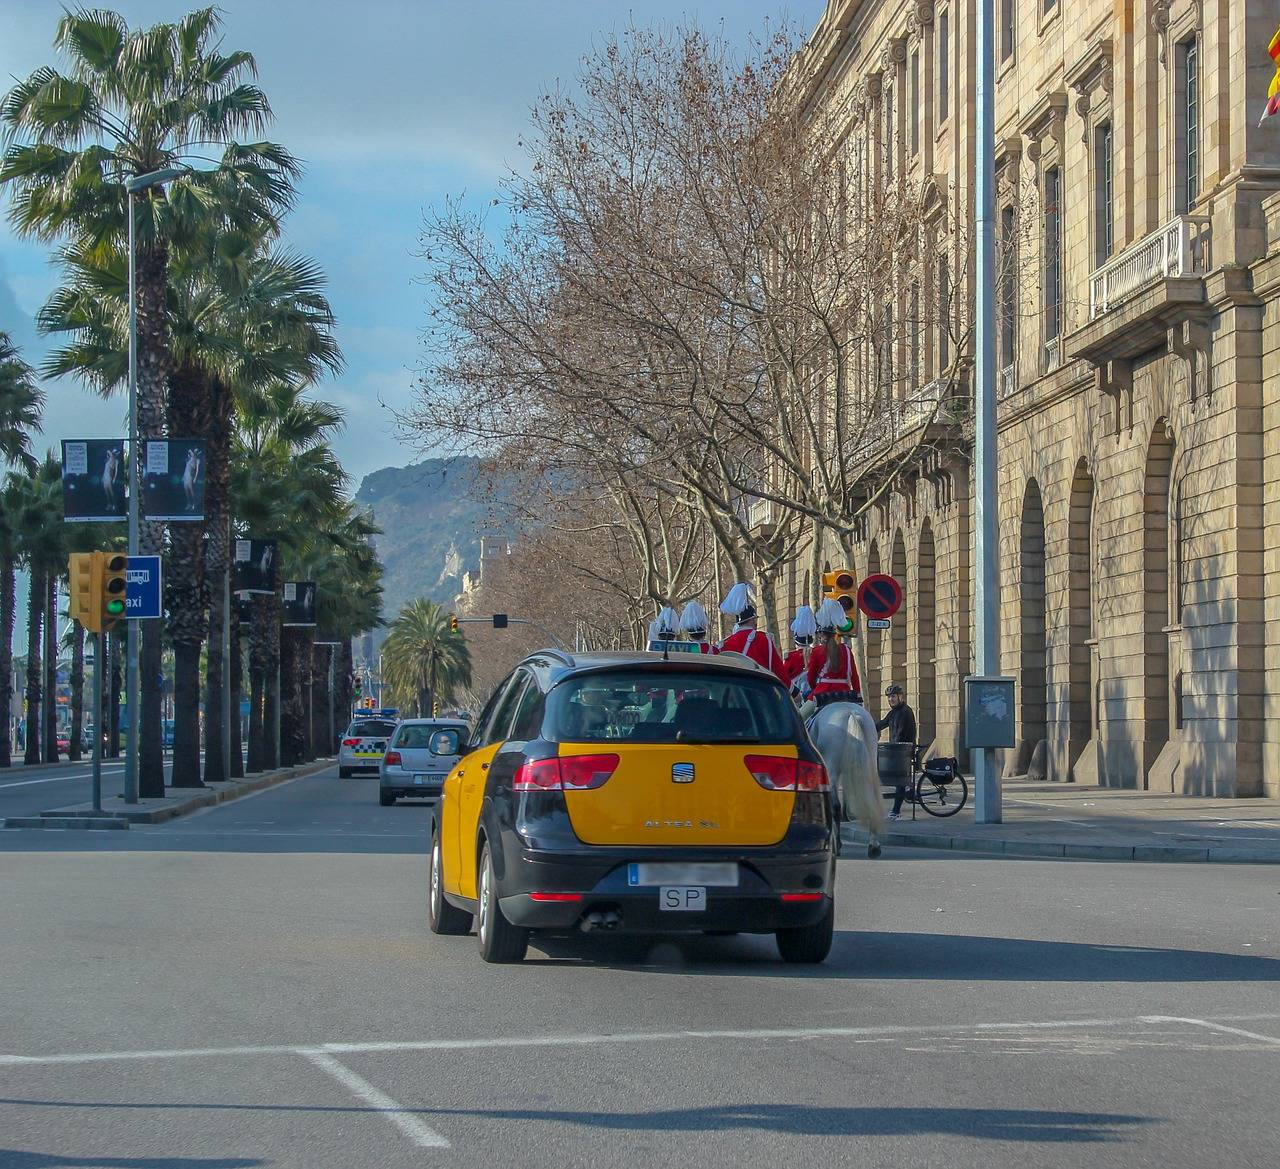 Особенности такси в барселоне